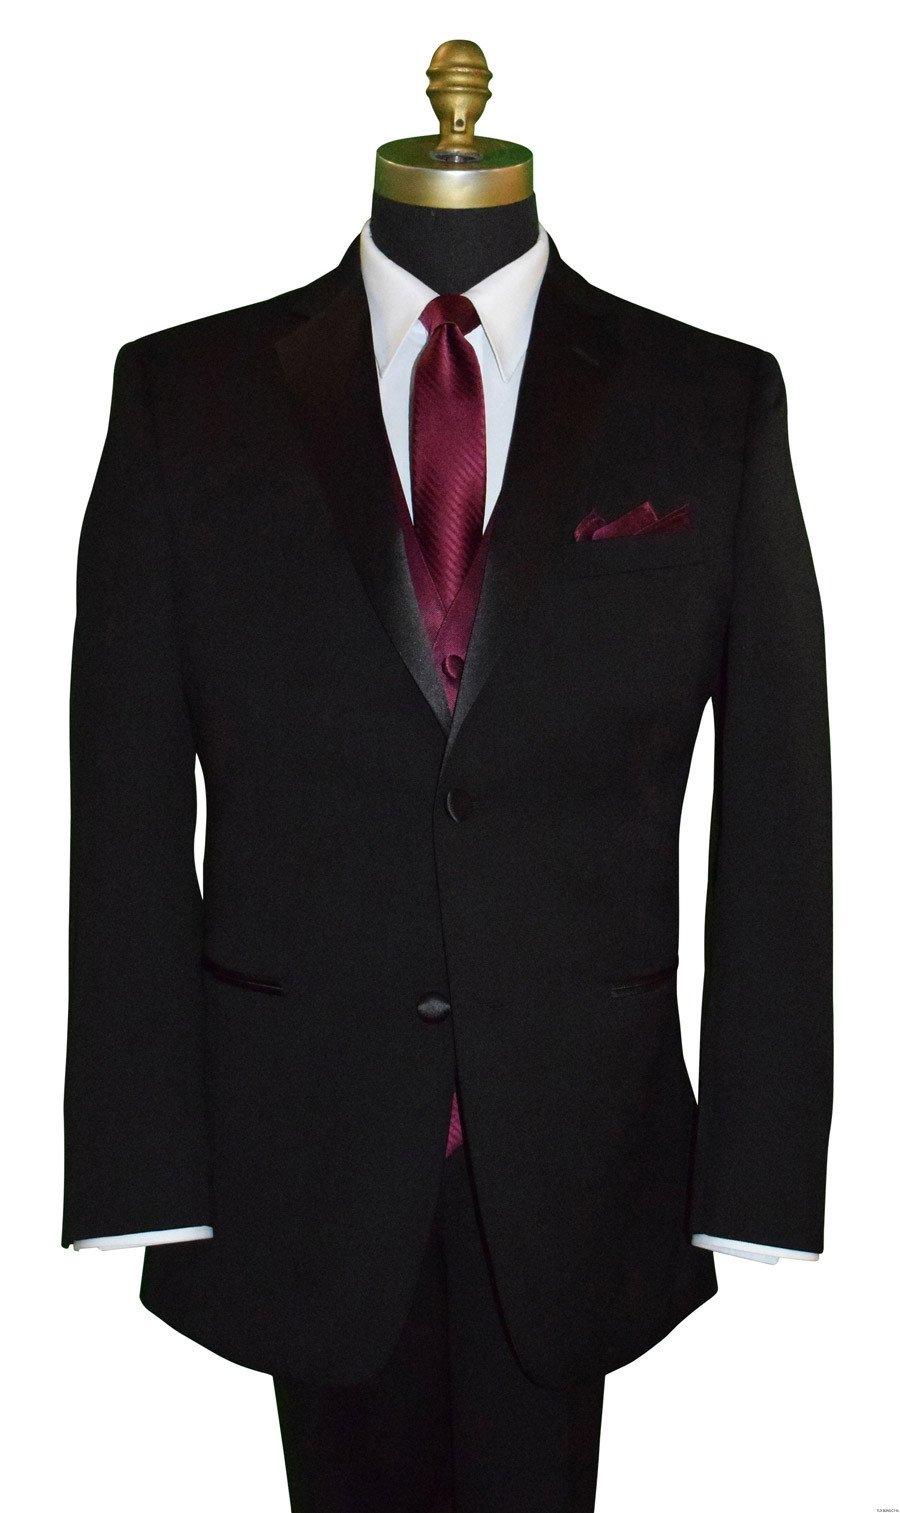 men's wine long skinny tie with wine vest and wine pocket handkerchief by San Miguel Formals